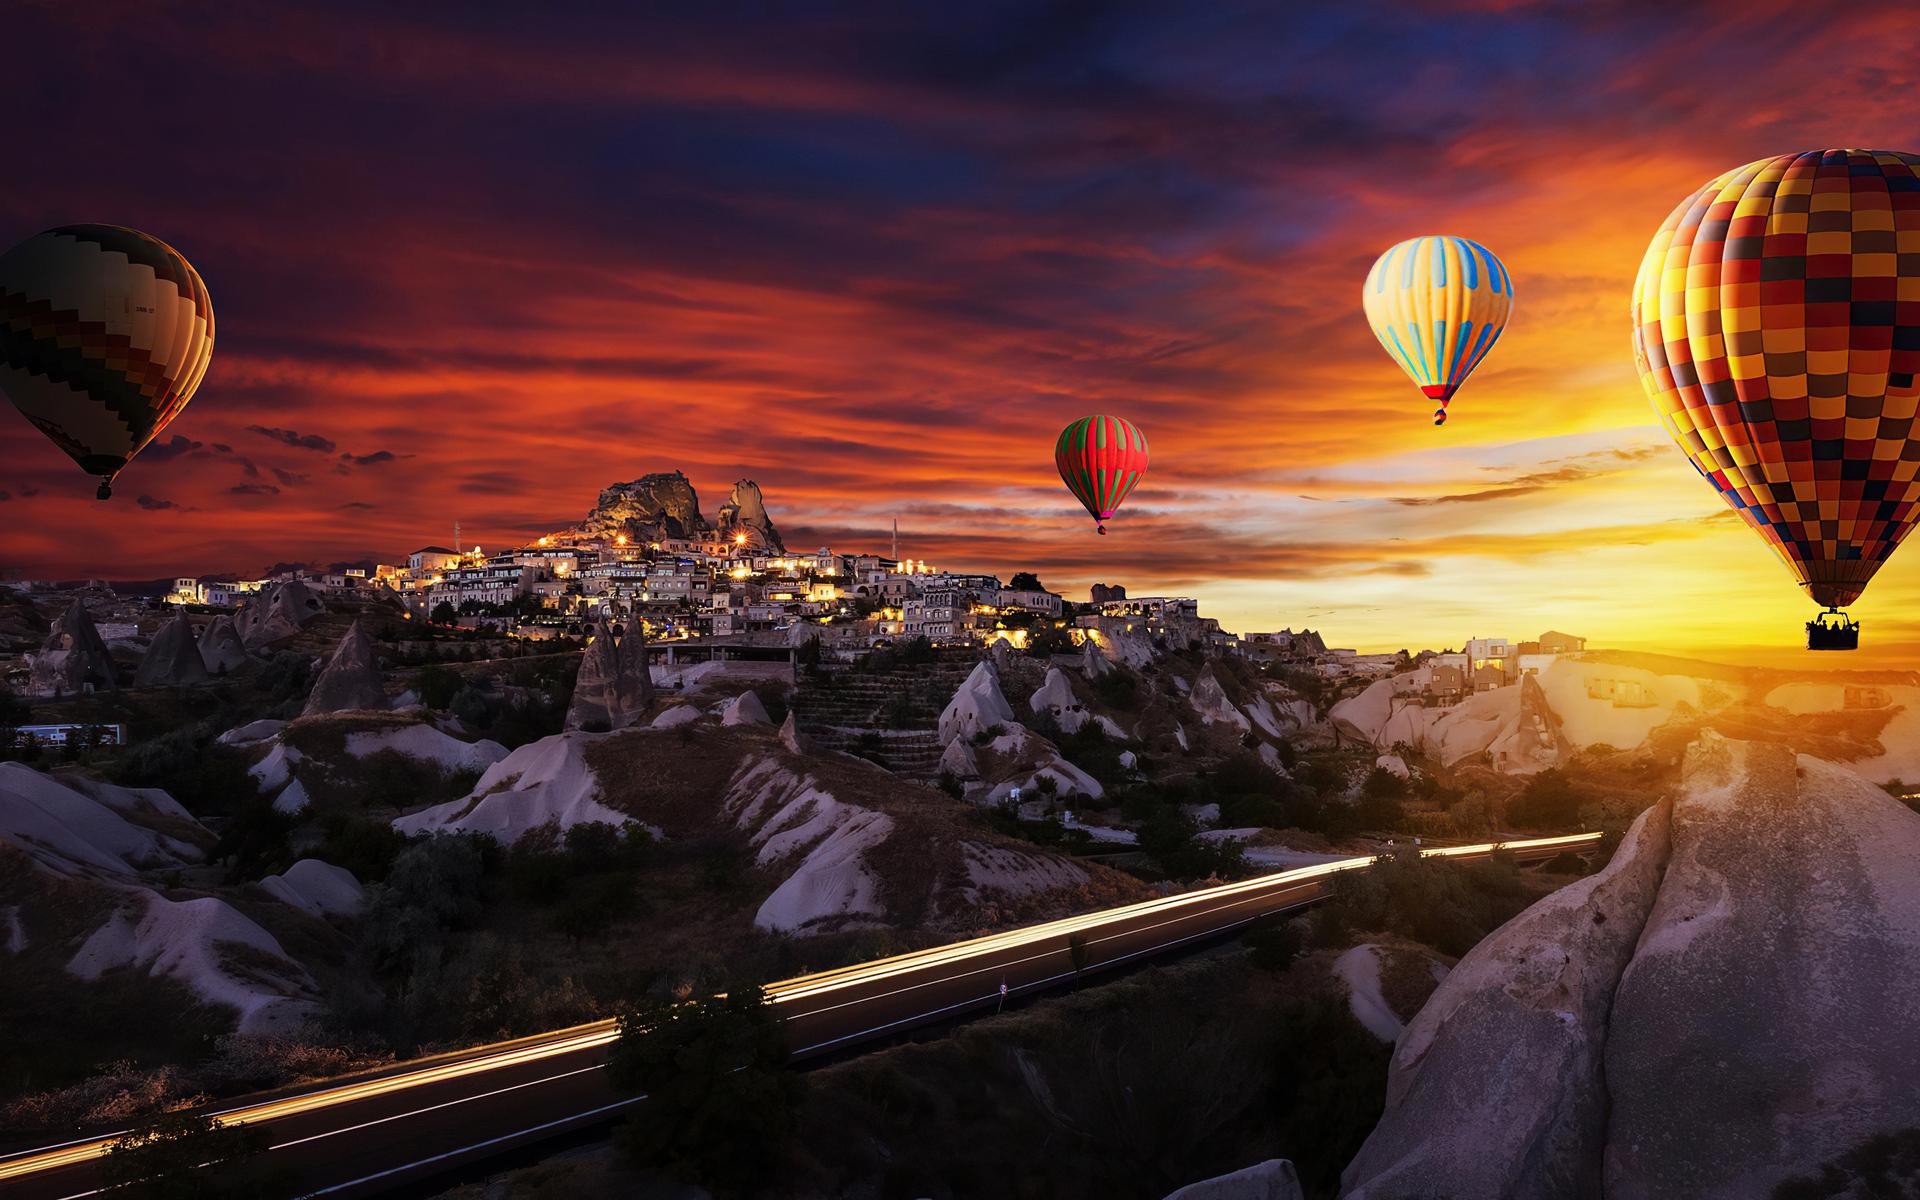 hot-air-balloons-over-goreme-4k-20.jpg